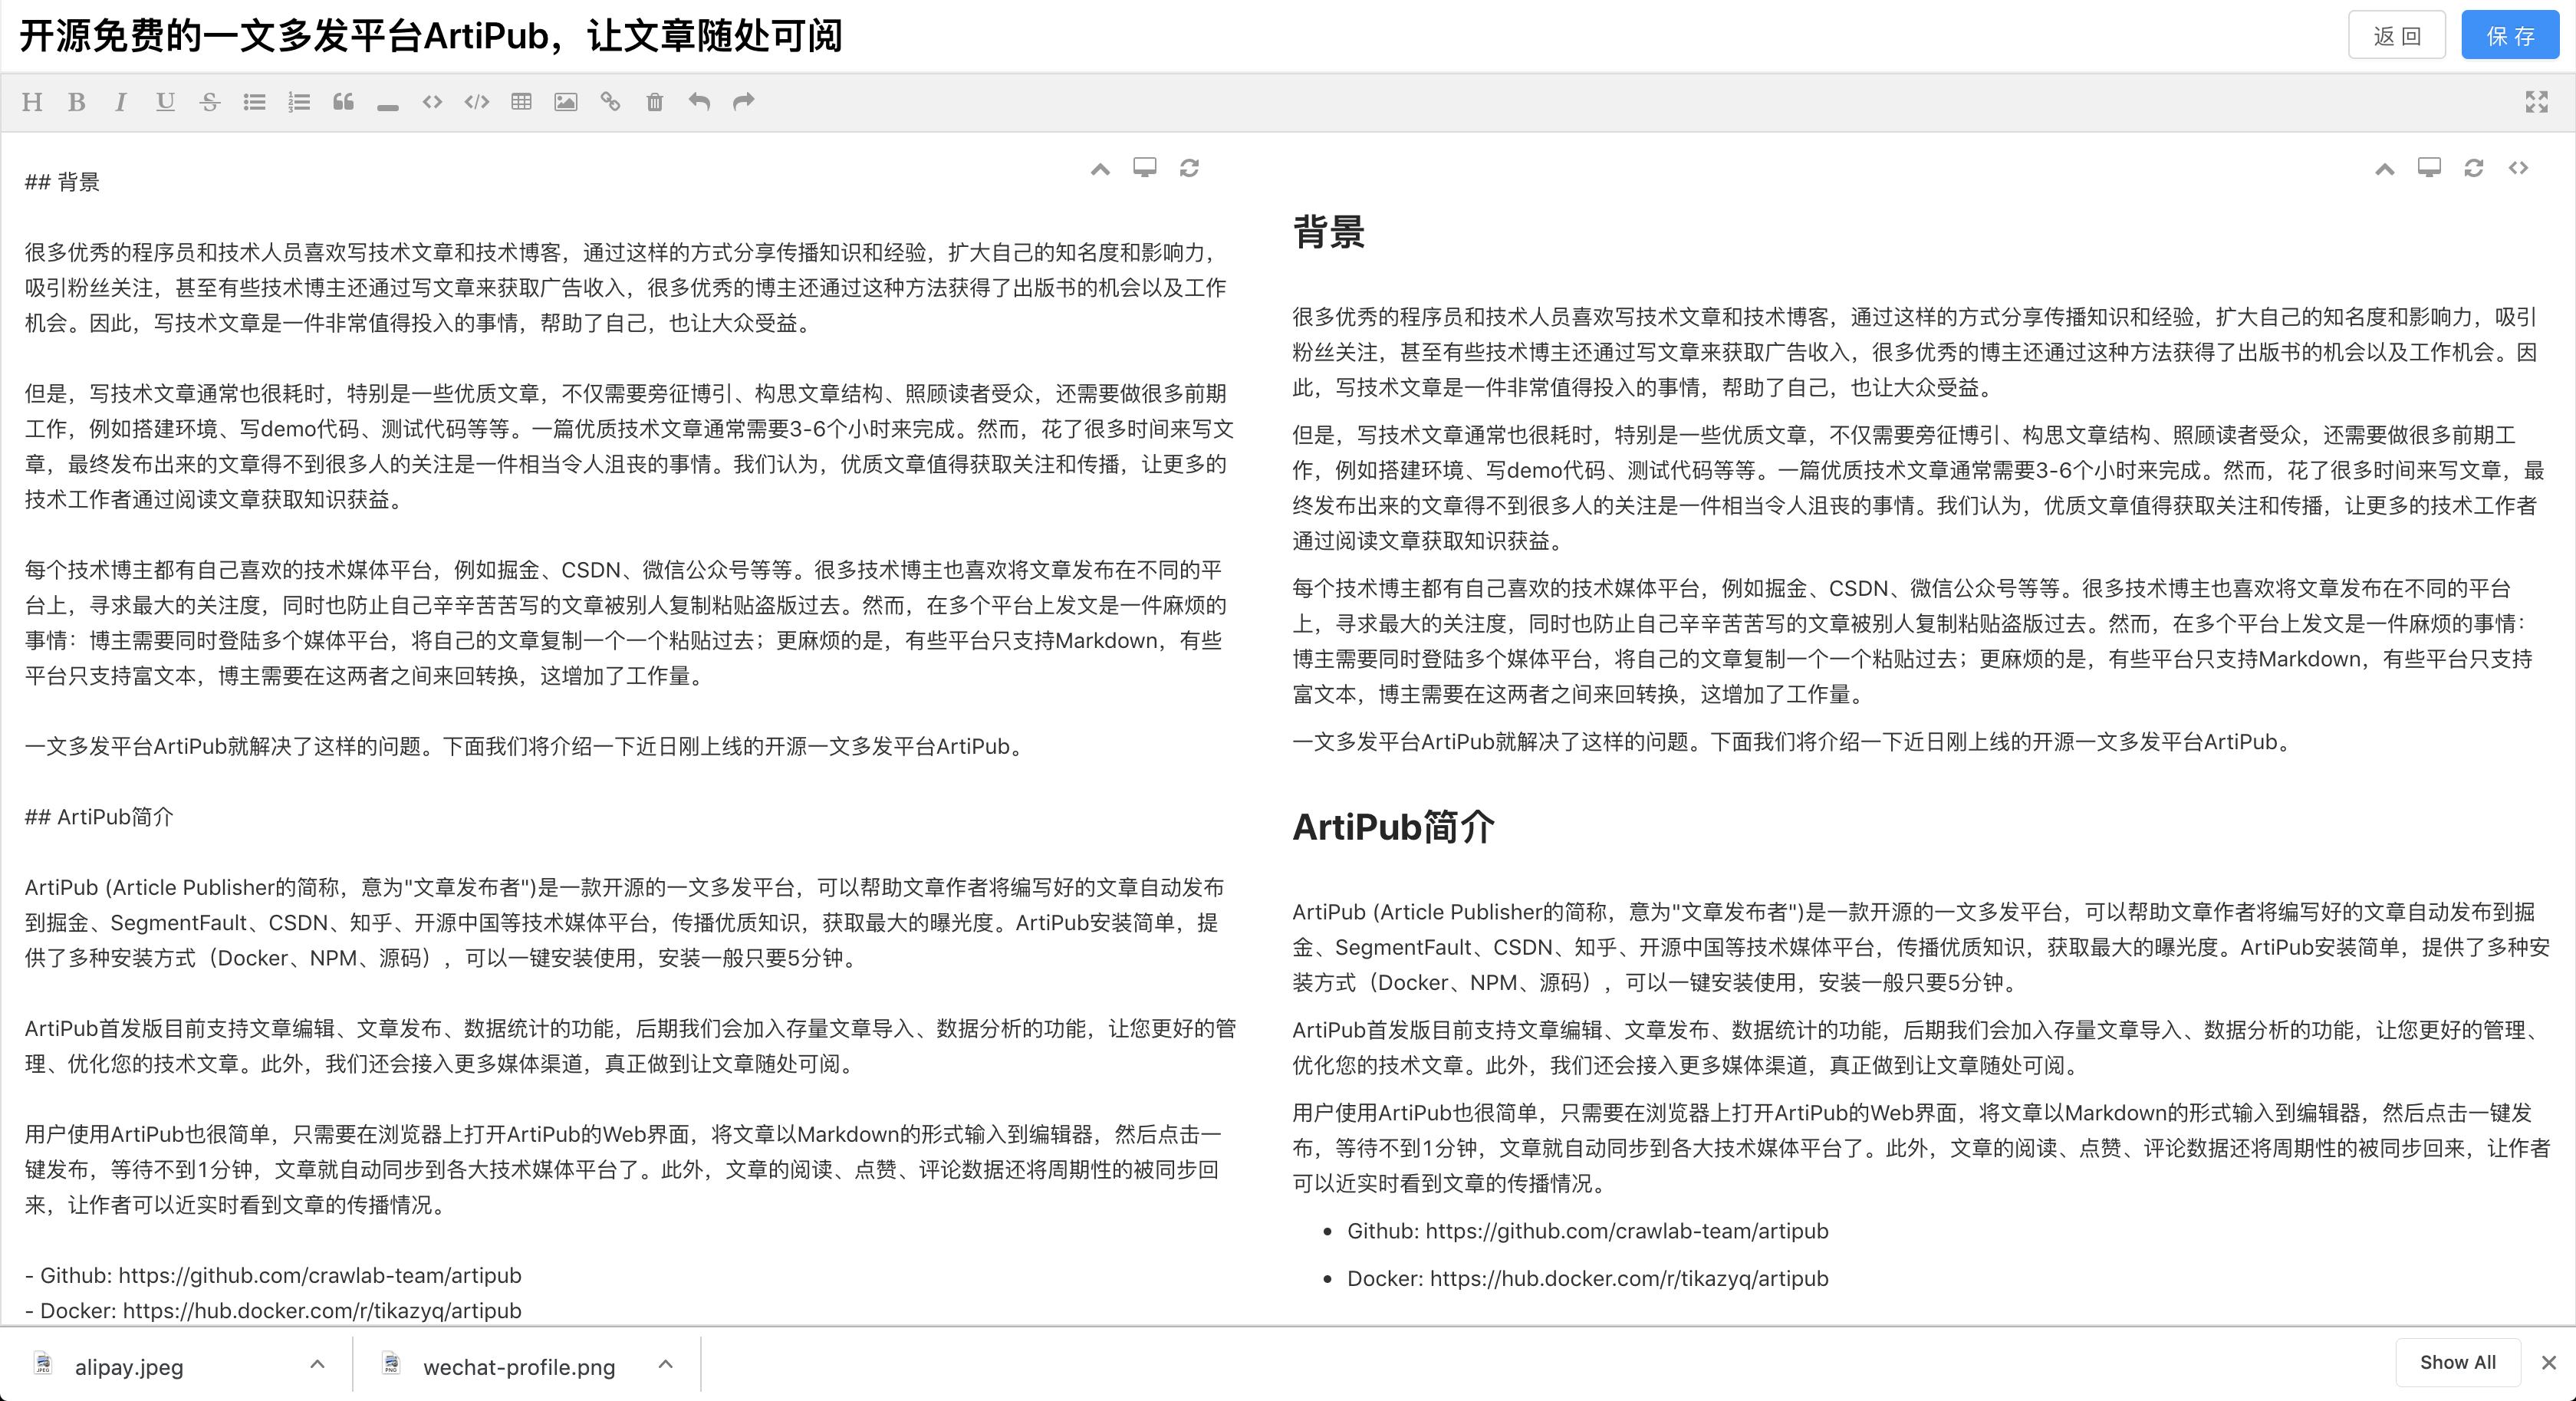 artipub-article-edit.png